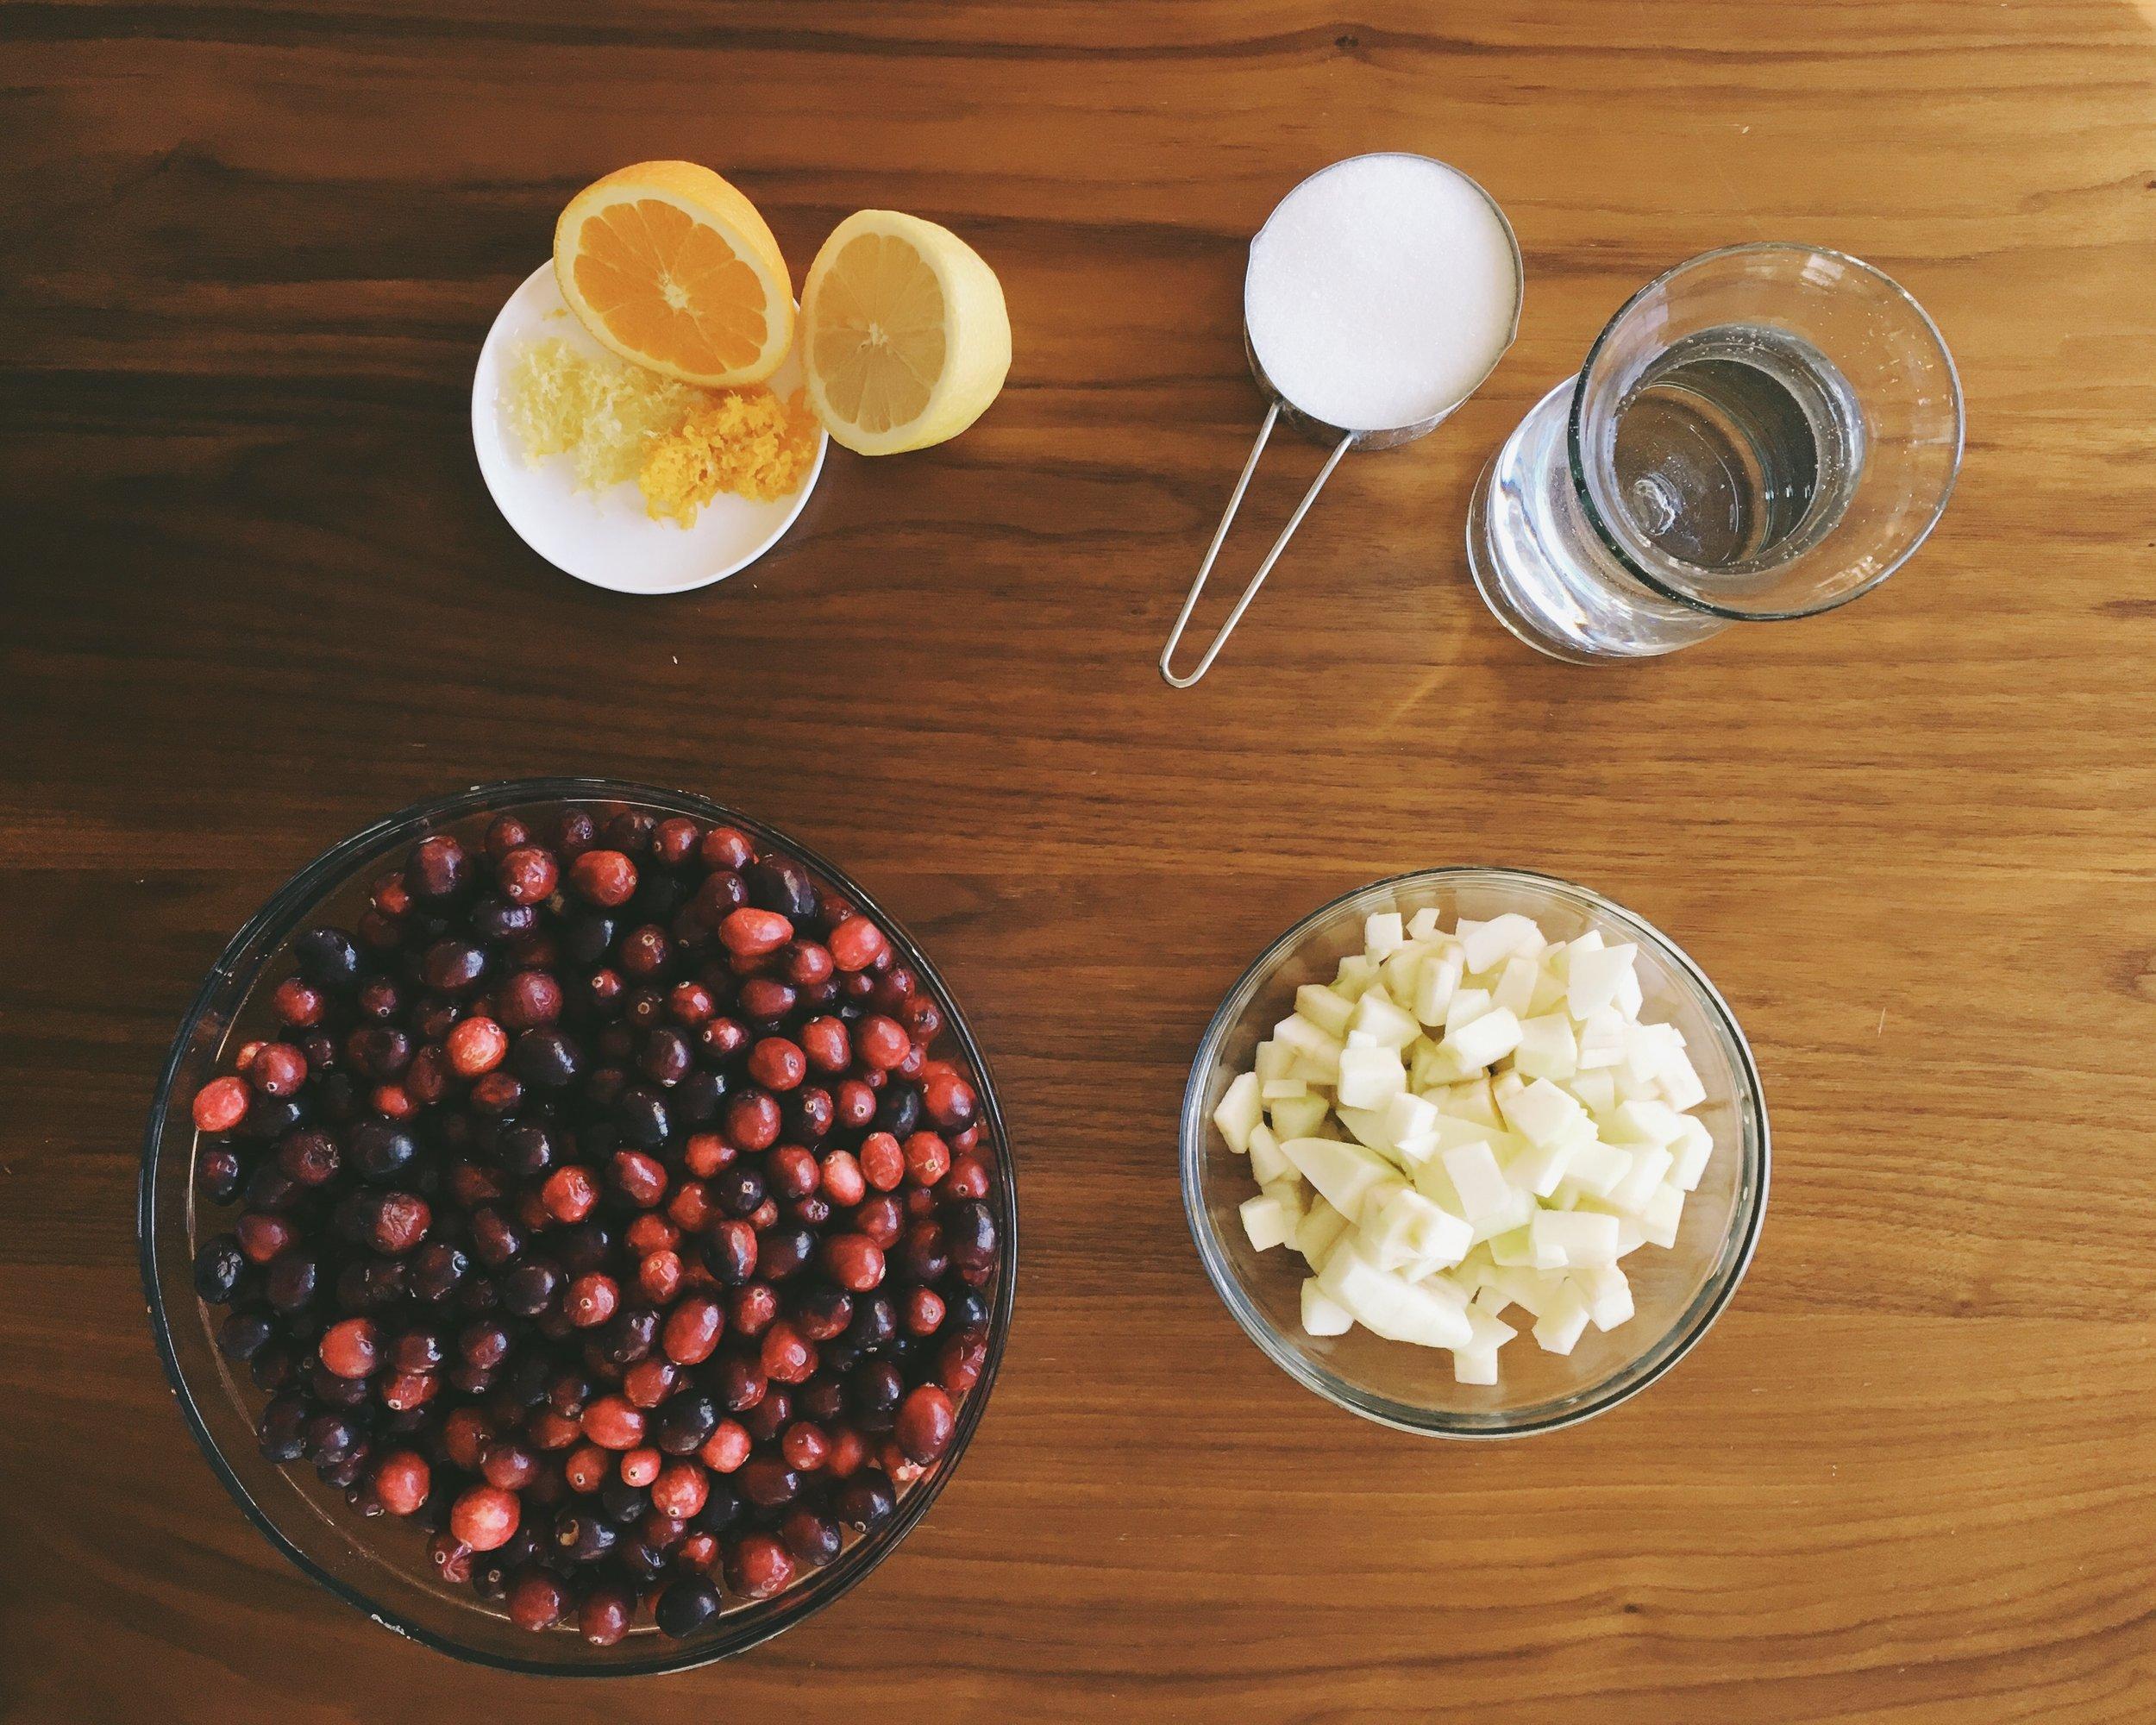 Cranberries, lemon + Orange, Granny Smith Apple, Sugar + Water